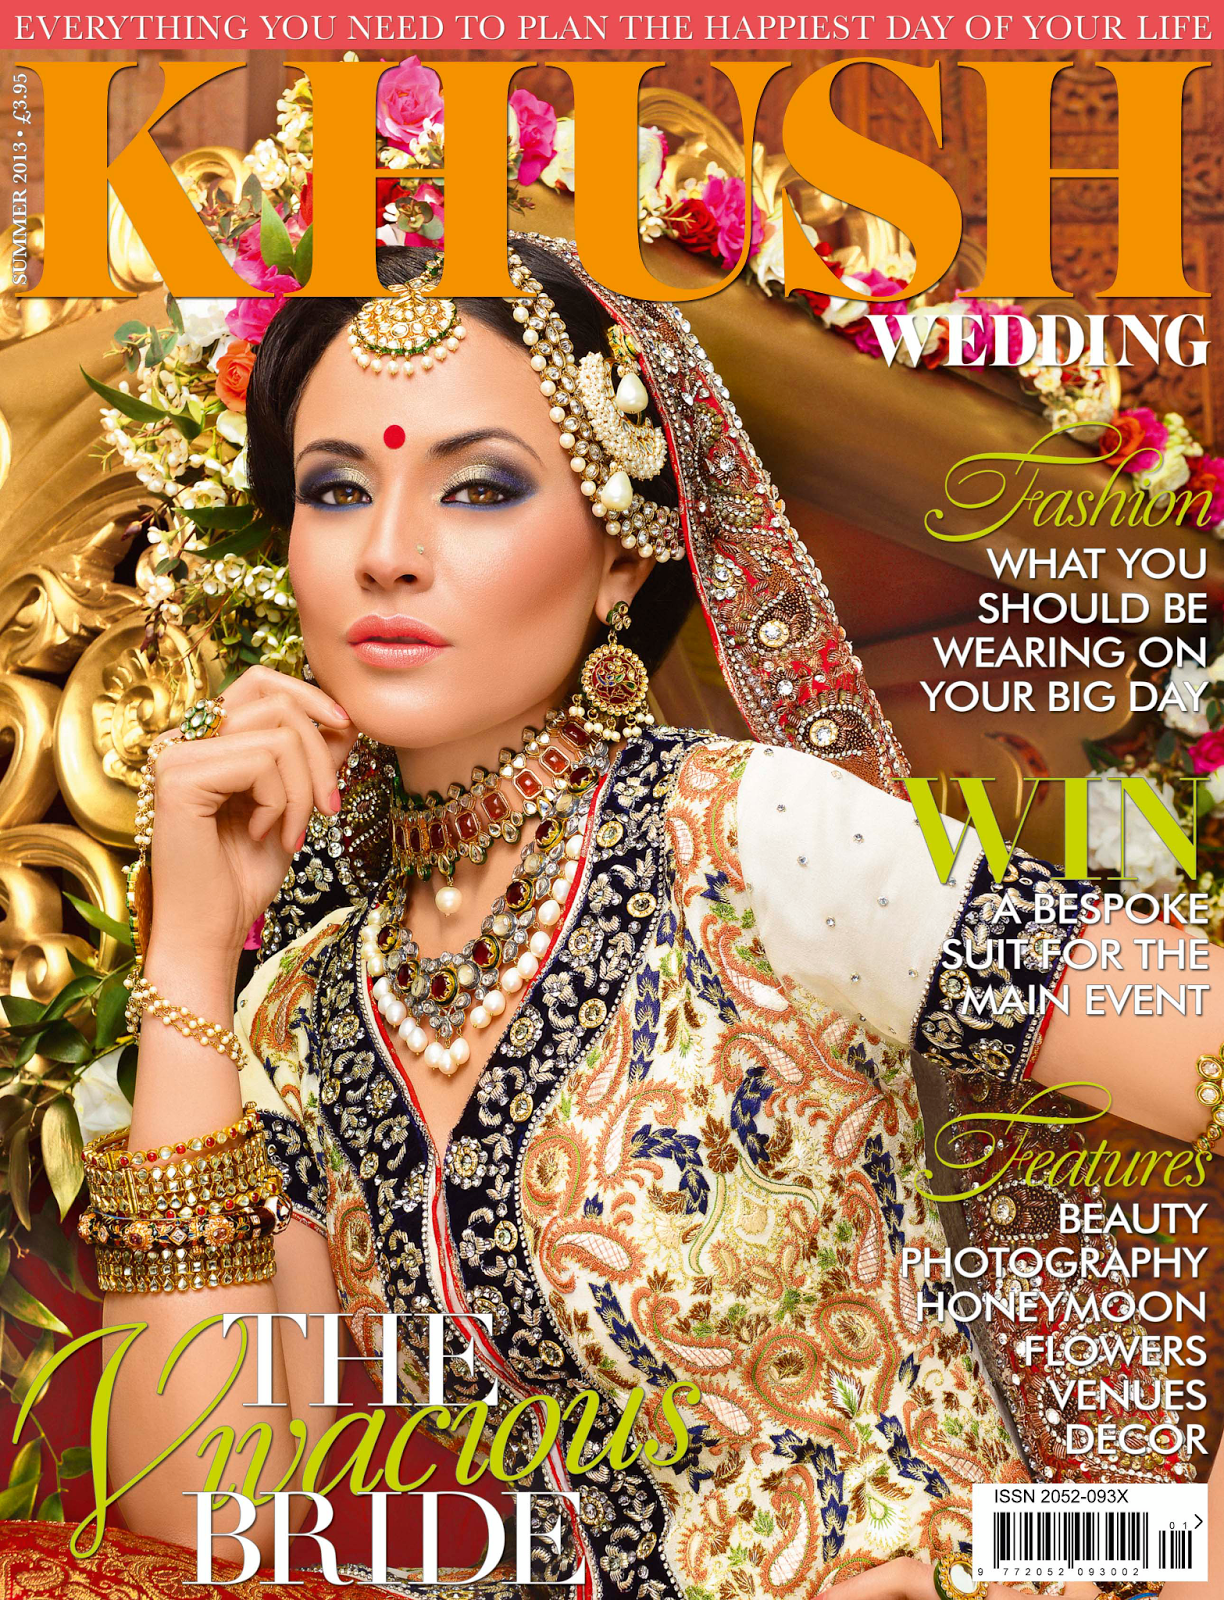 wedding magazines Asian Fashion Blog Khush Wedding Magazine First Issue Summer